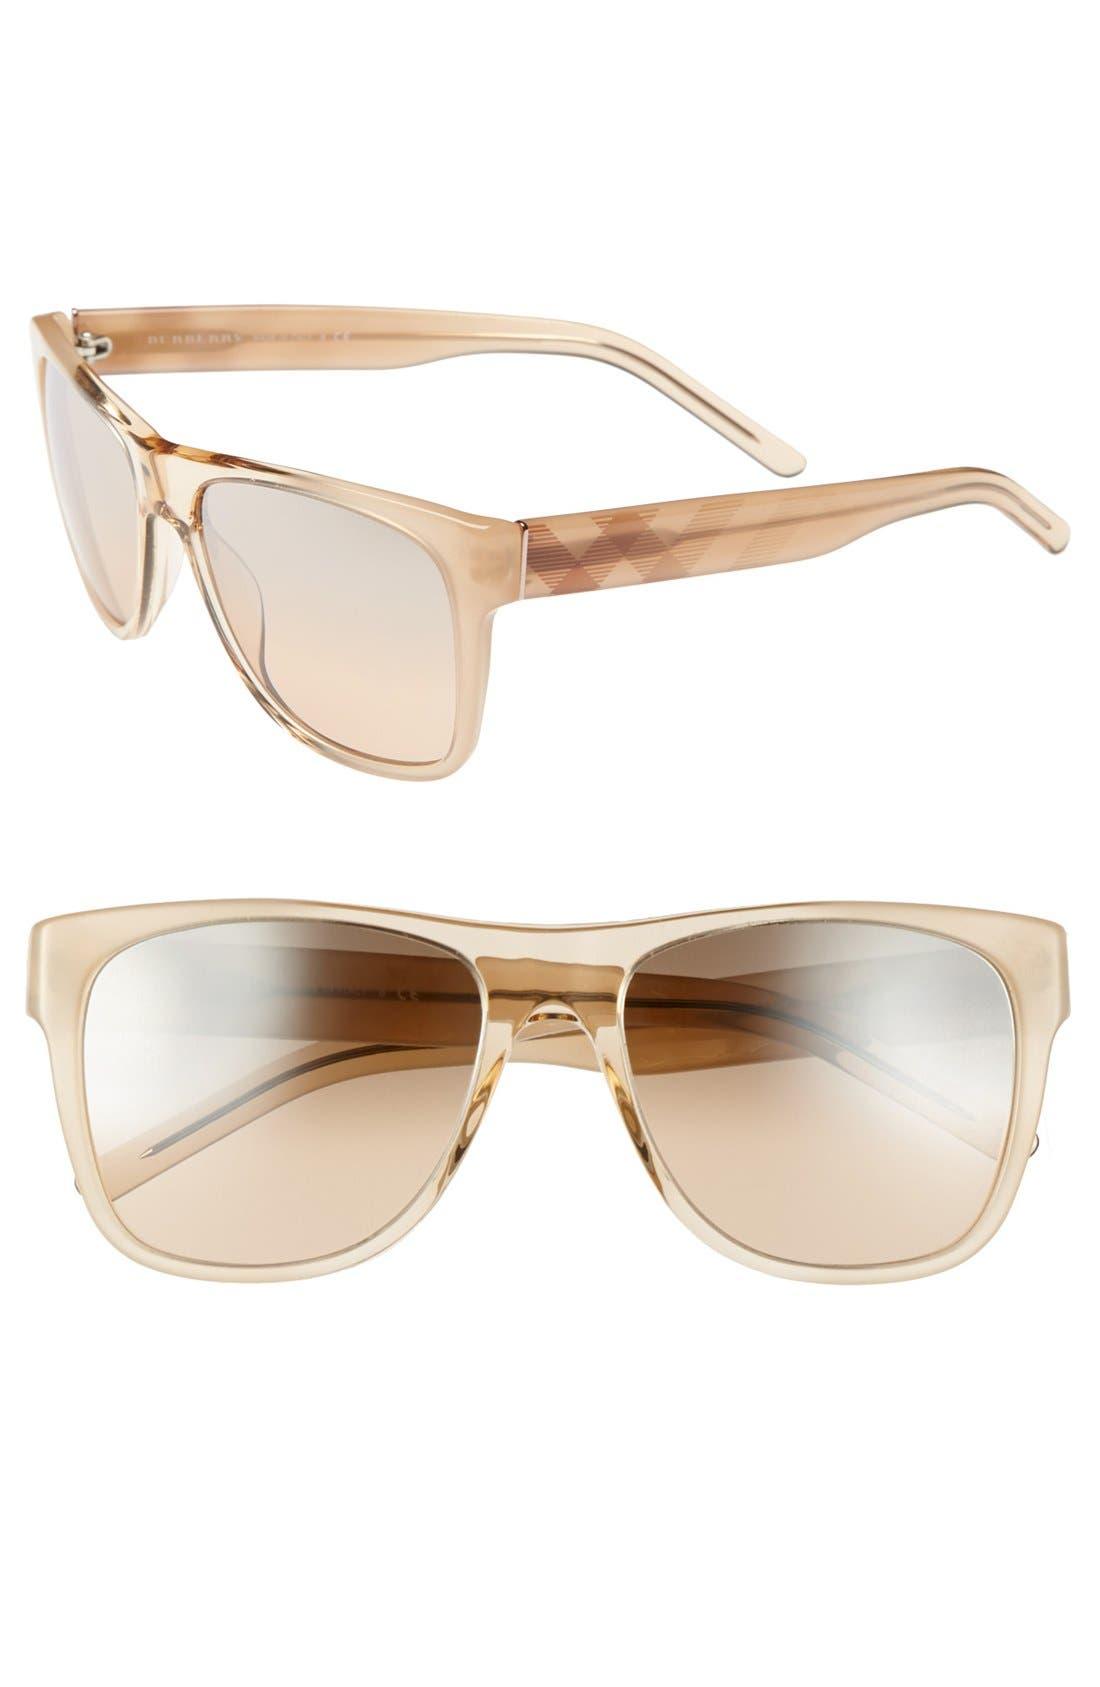 Main Image - Burberry 56mm Translucent Sunglasses